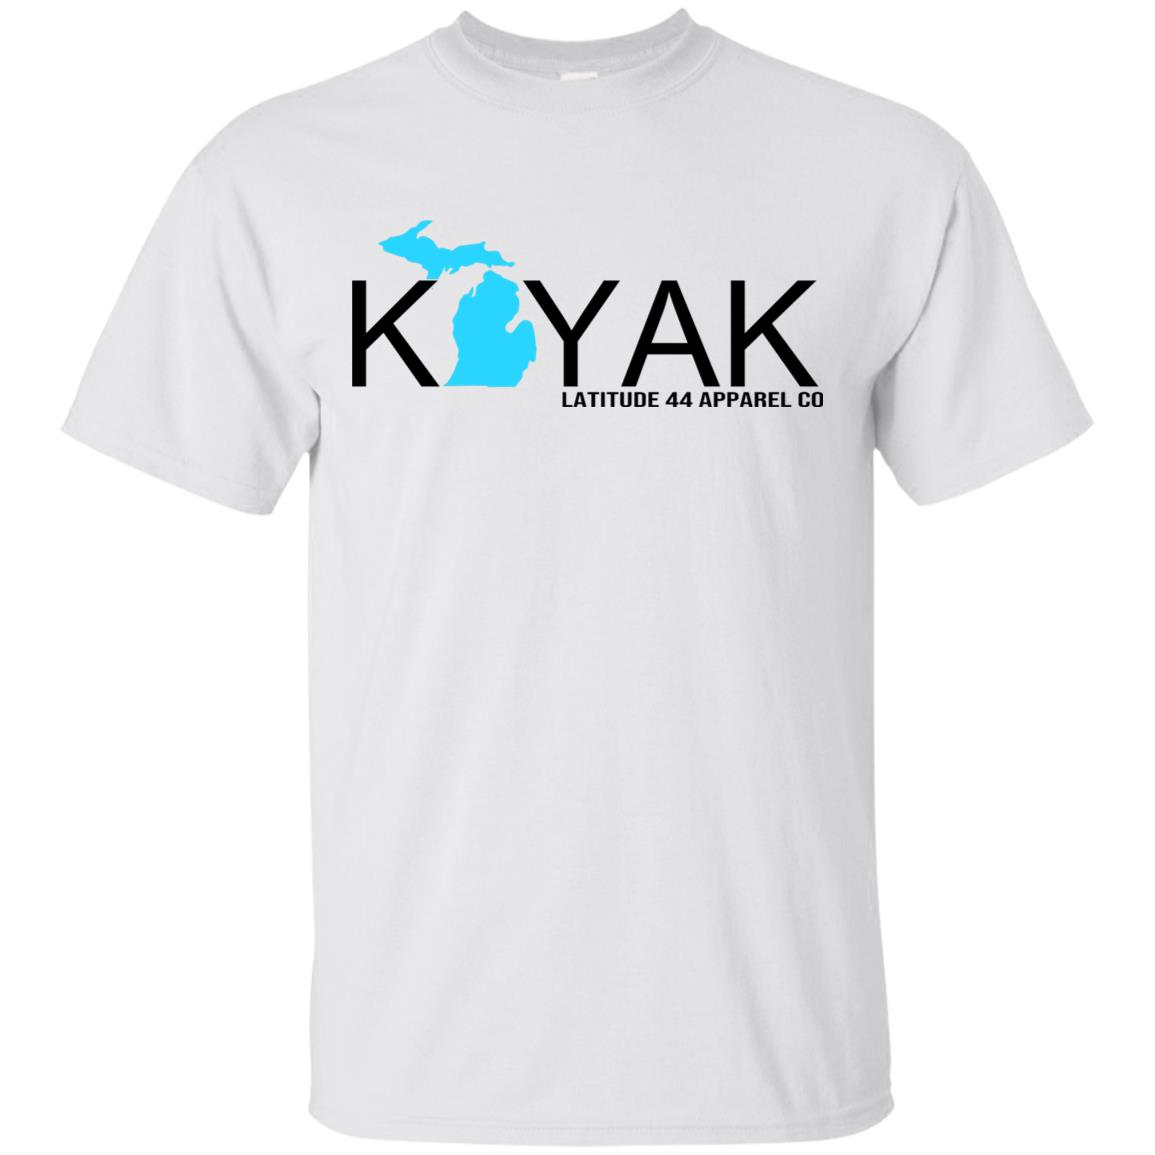 Kayak Michigan for the Outdoor Whitewater adventurer Unisex Short Sleeve